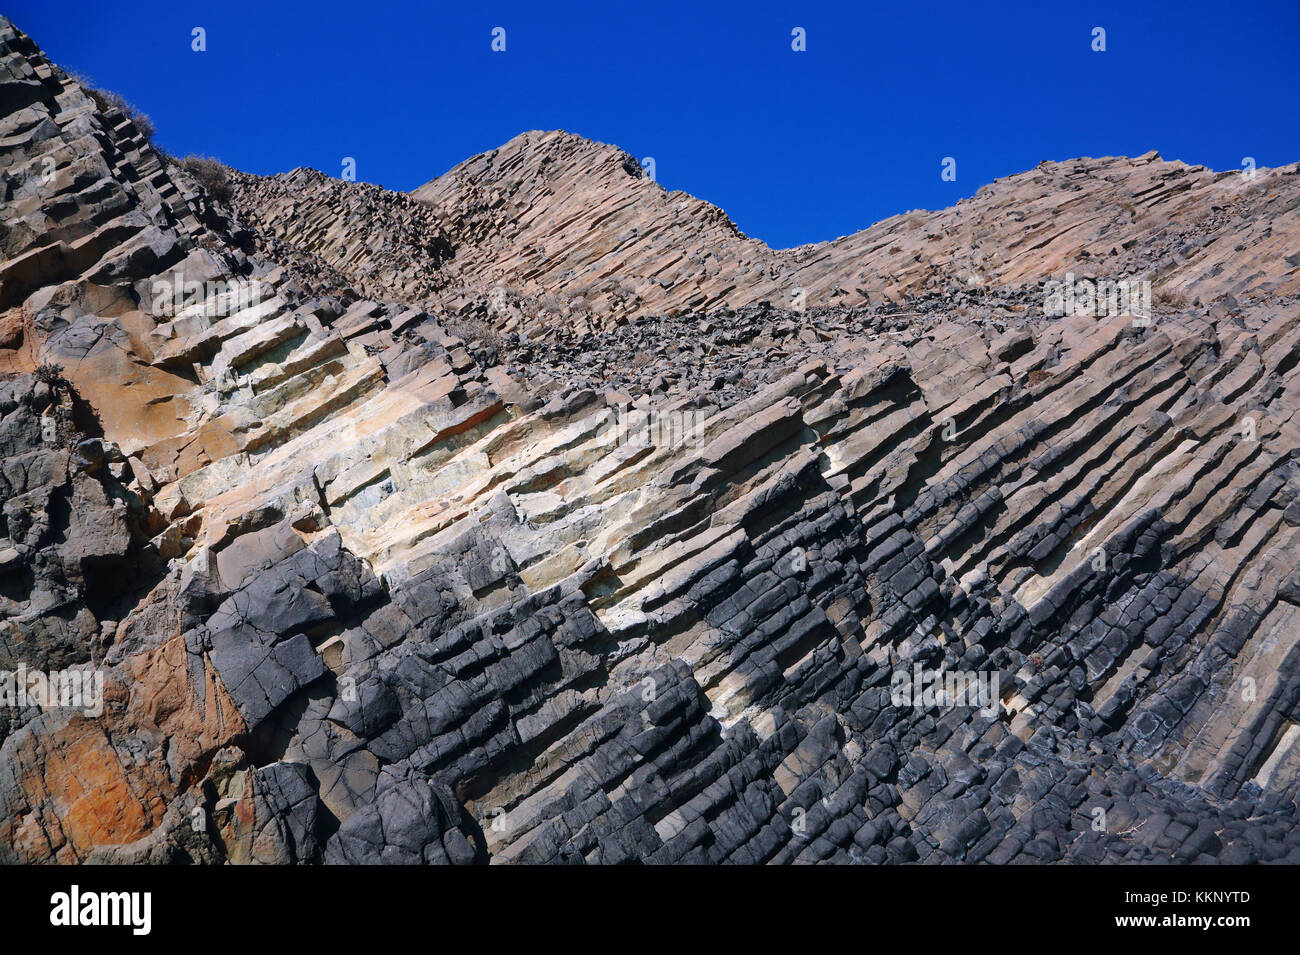 Cabo de Gata national park,Almeria - Stock Image